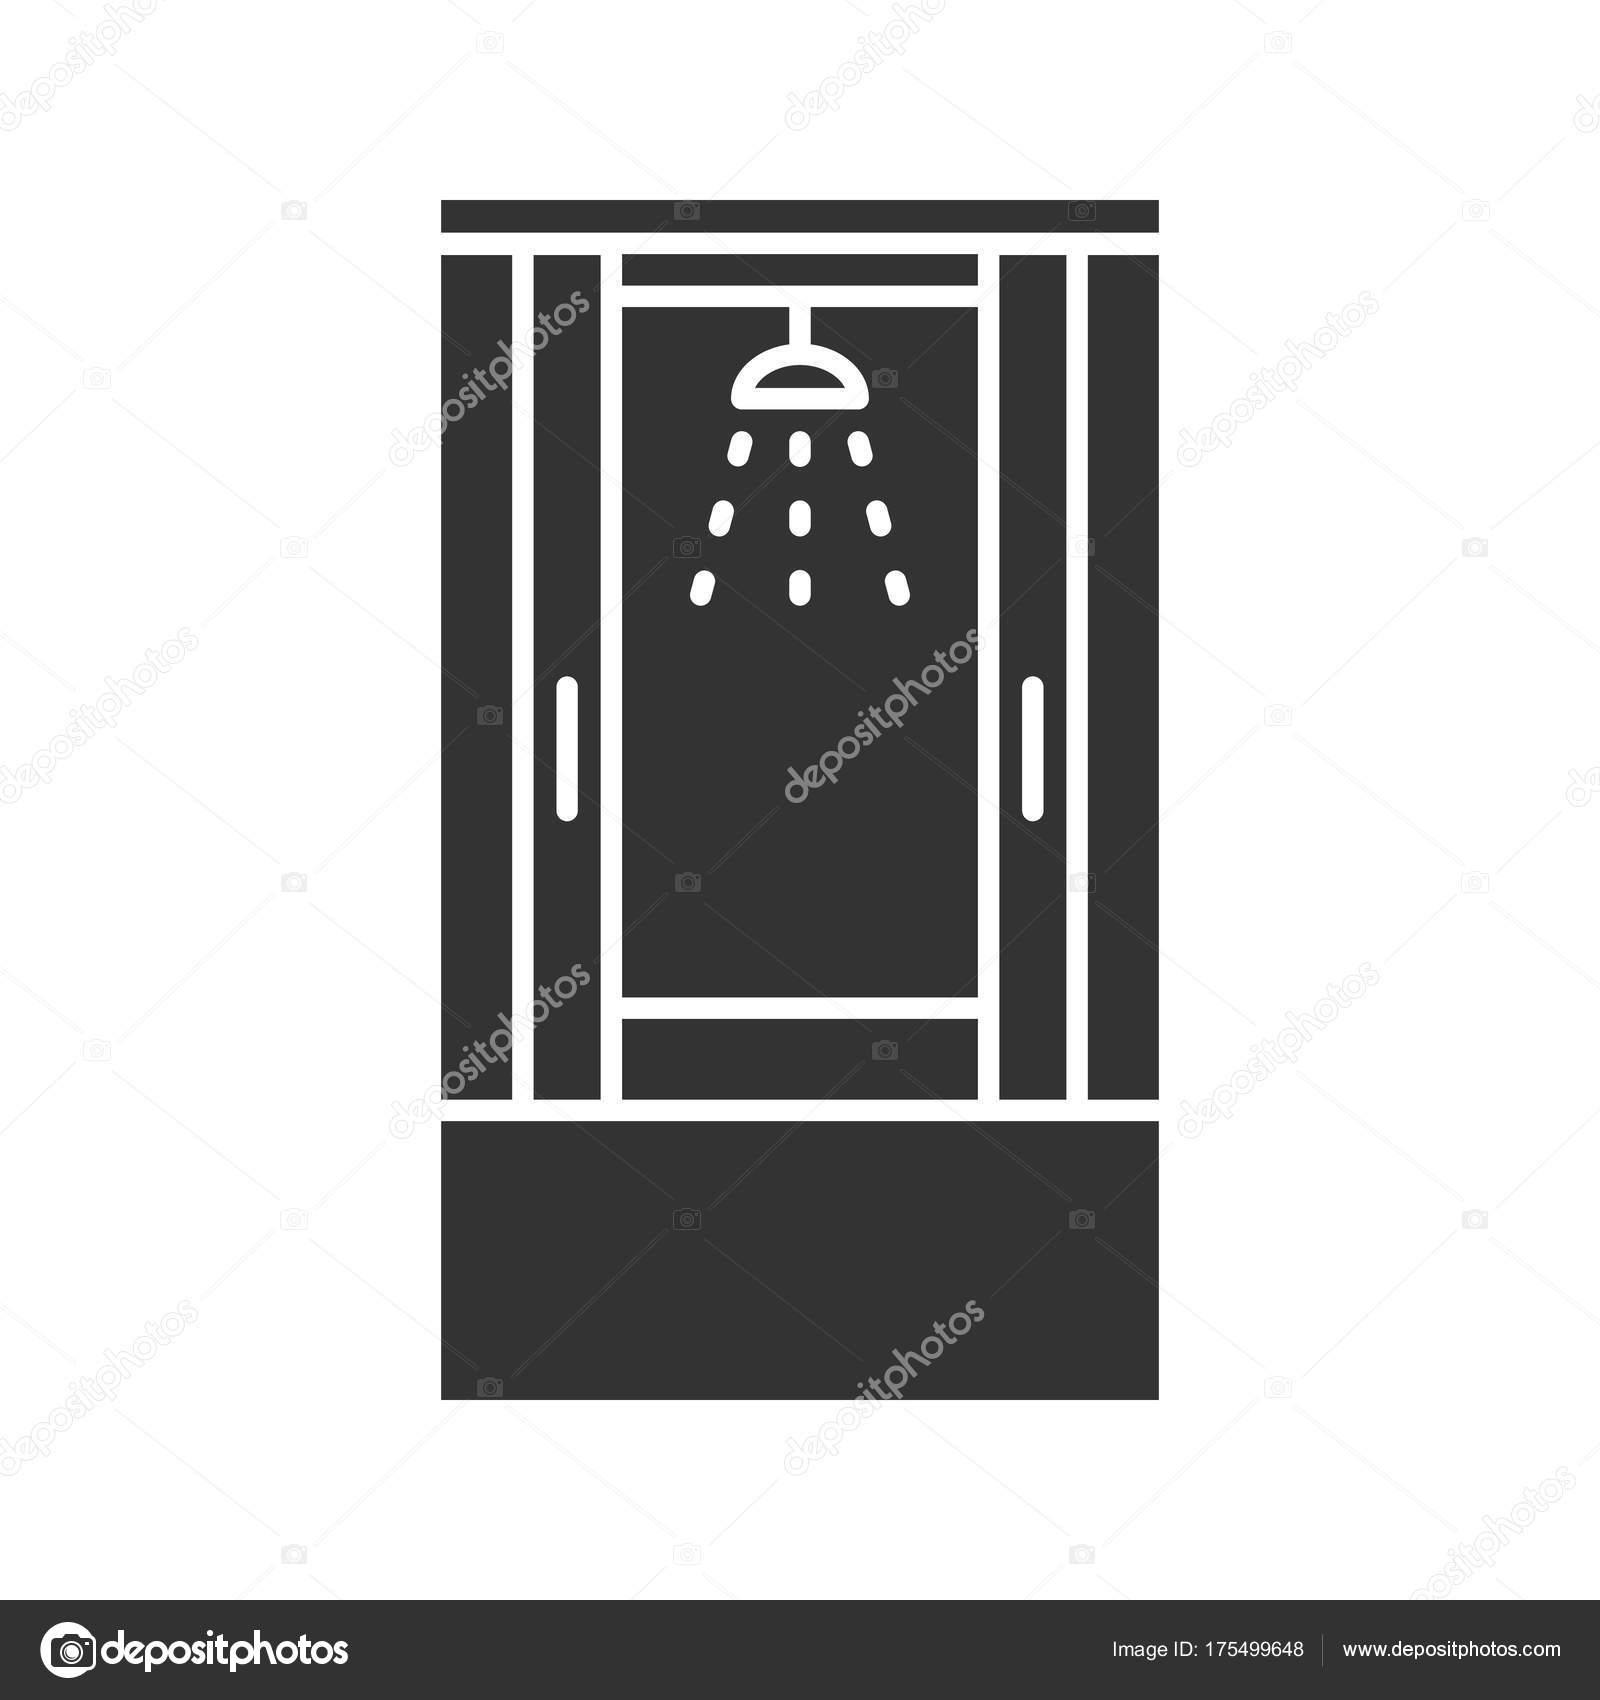 Duschkabine clipart  Dusche Kabine Glyph Symbol Silhouette Symbol Duschkabine Duschkabine ...